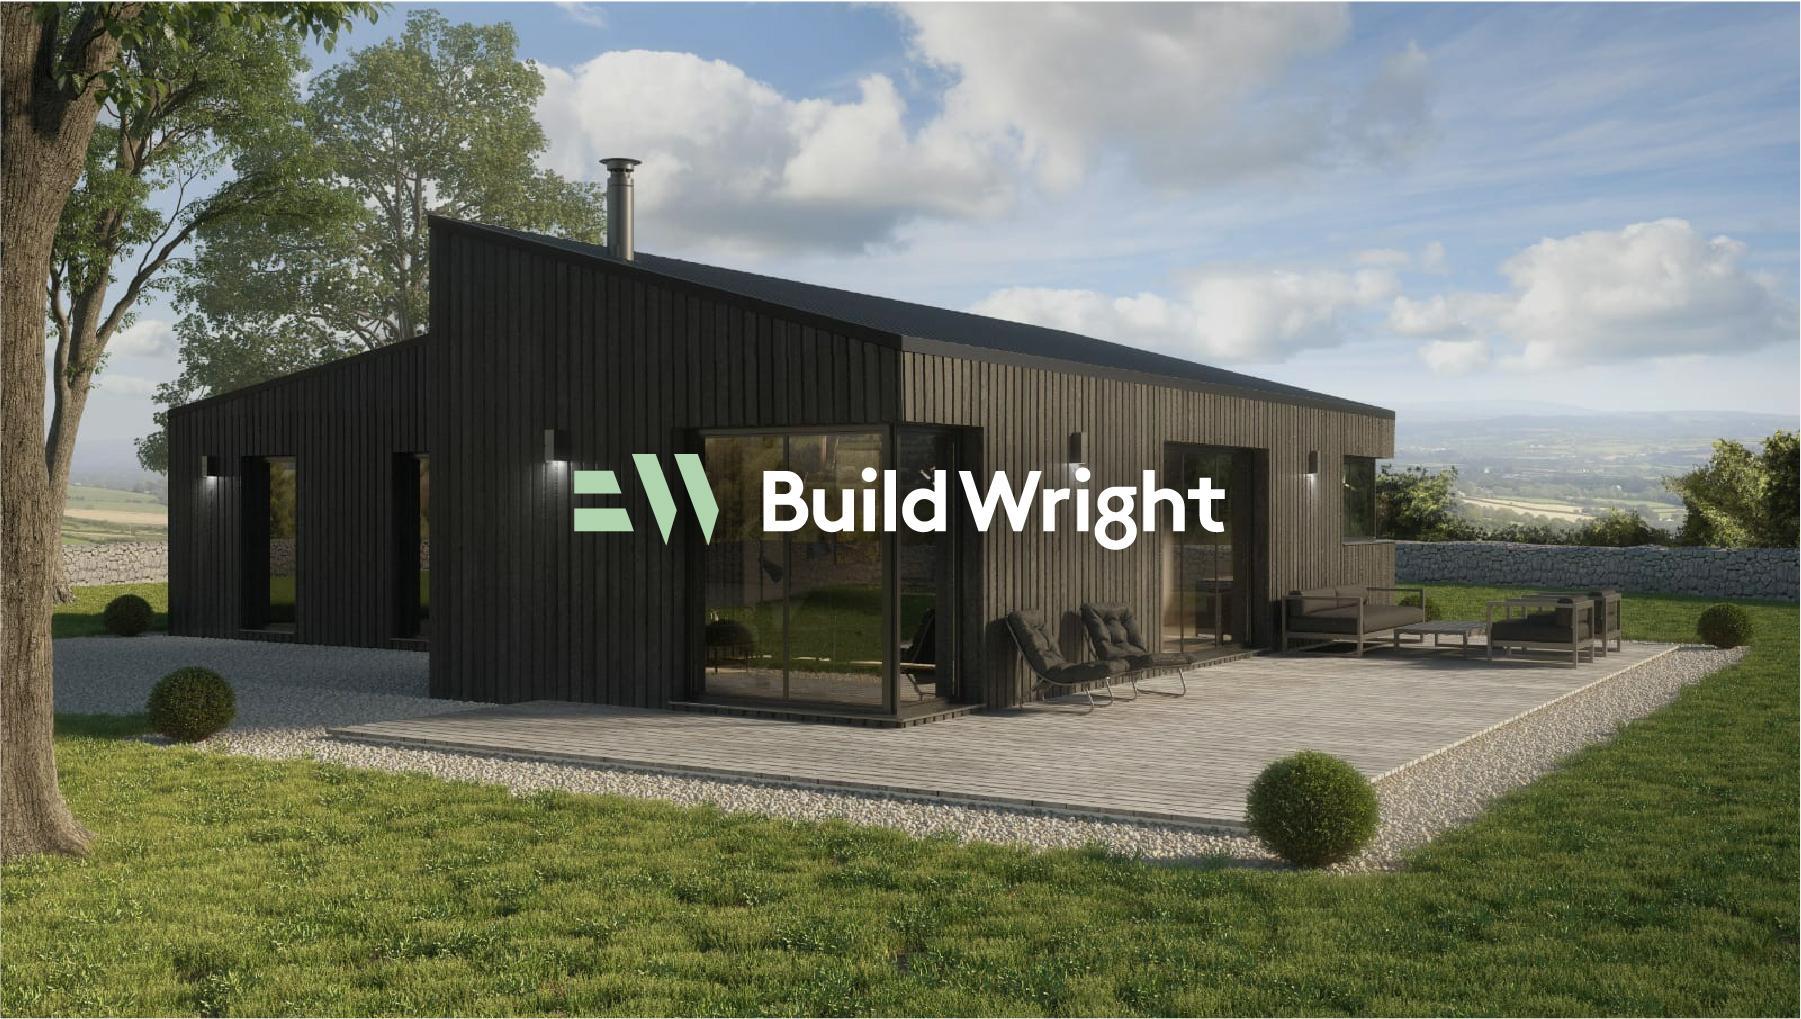 BuildWright